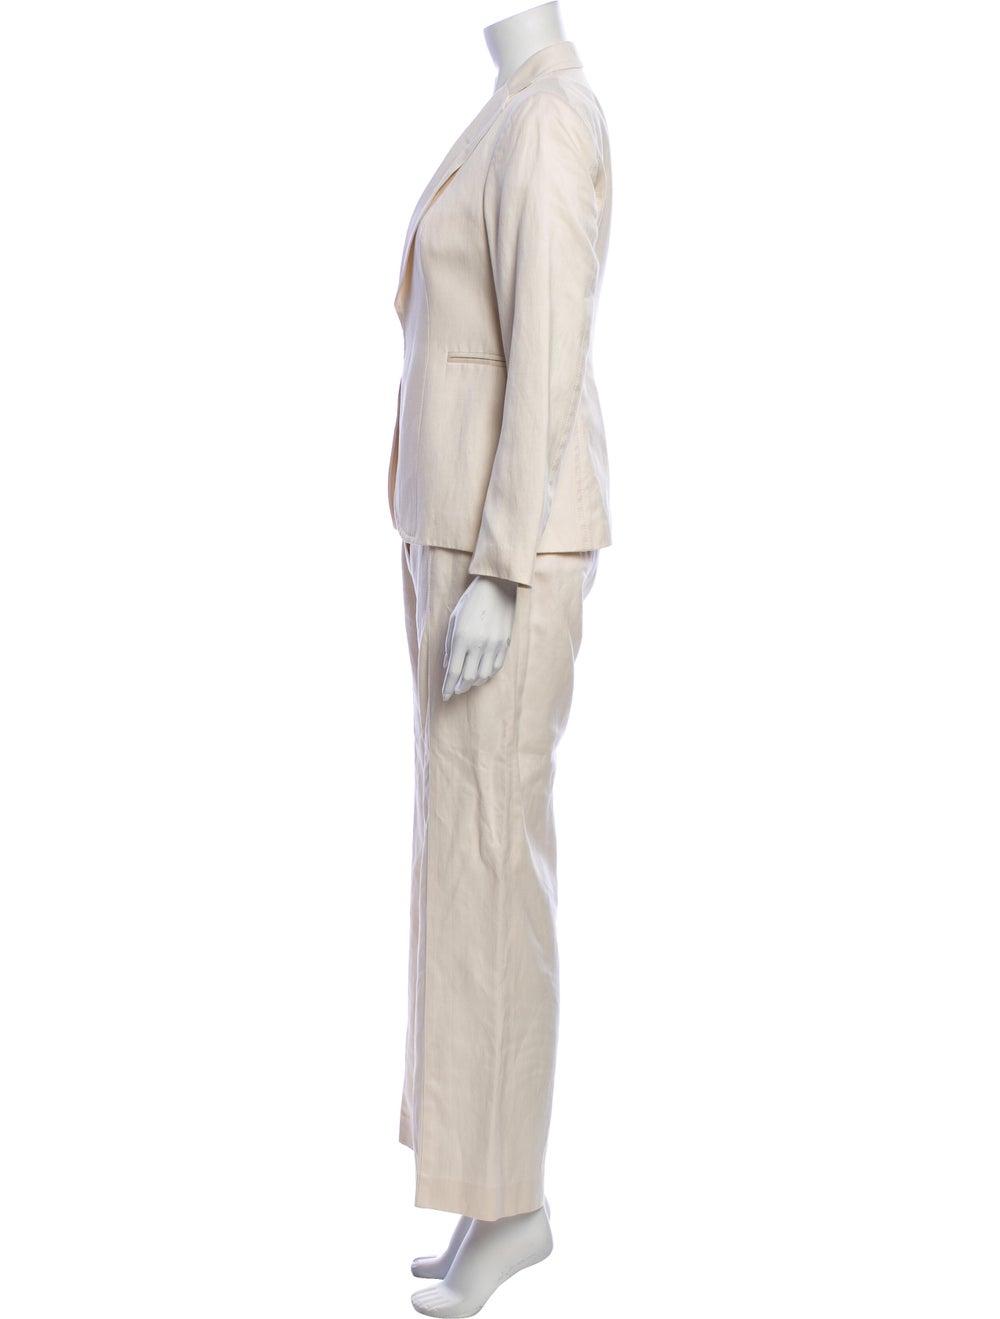 Costume National Pantsuit - image 2